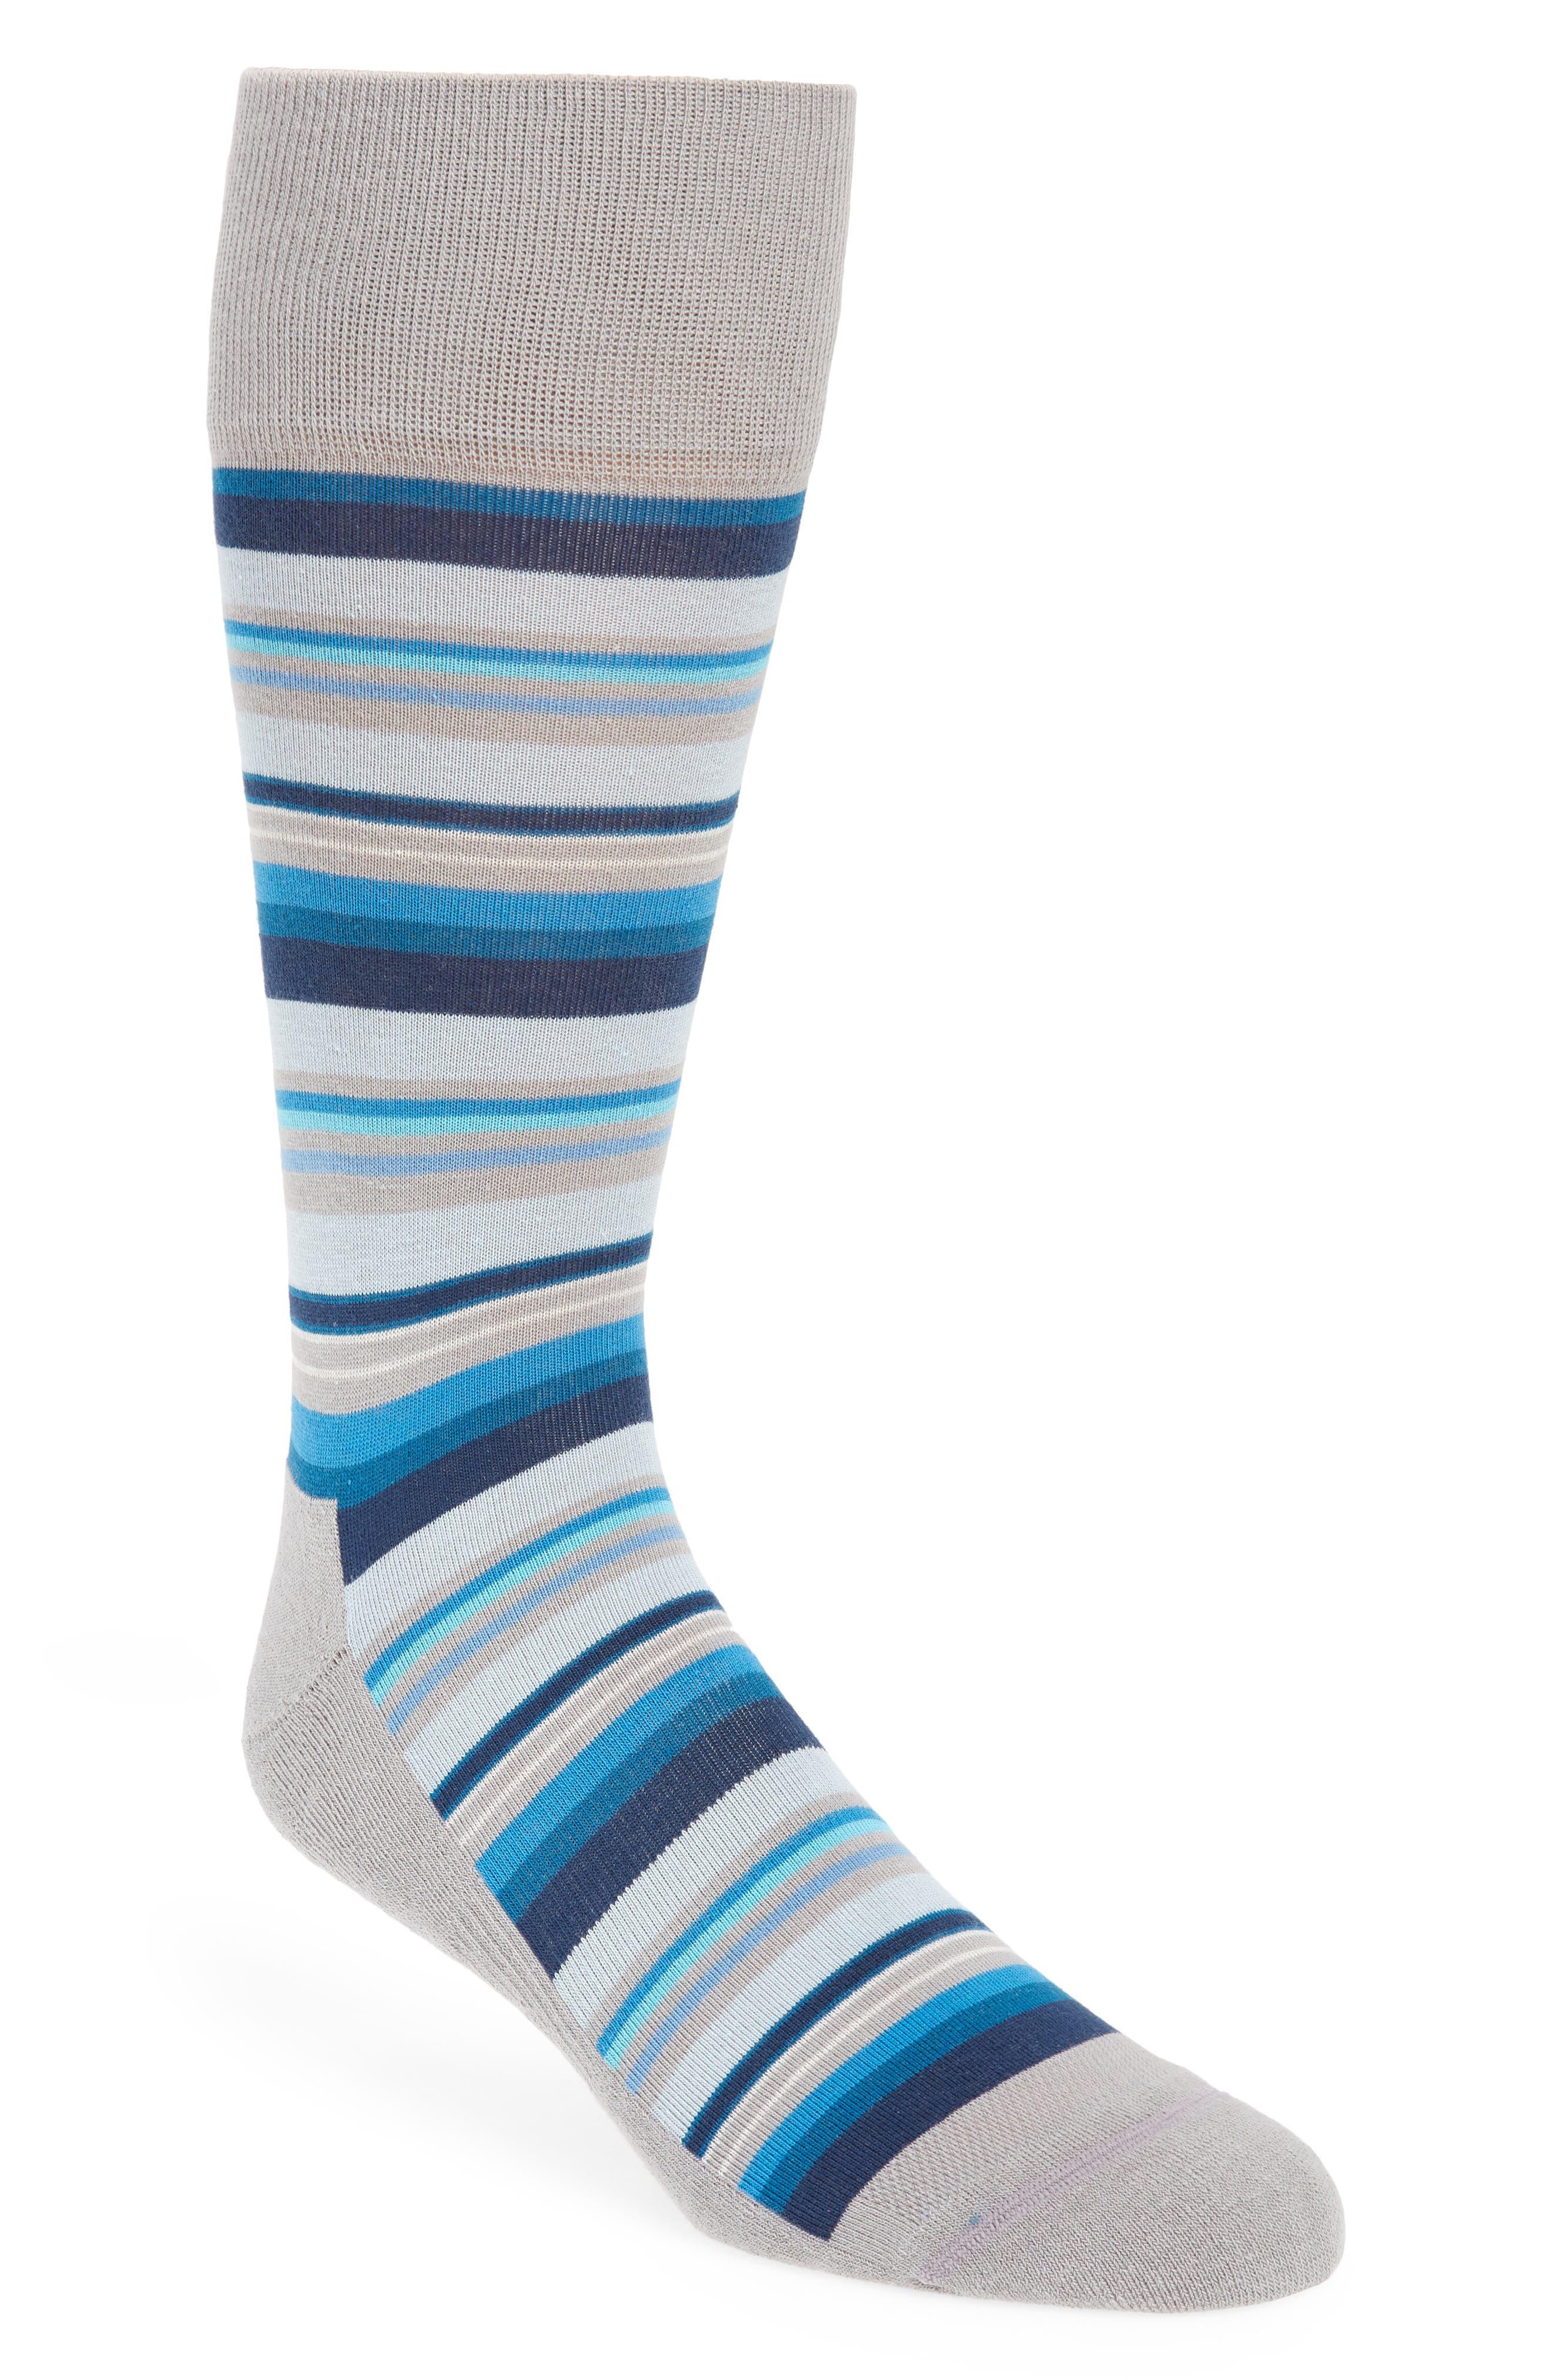 Variegated Stripe Socks,                         Main,                         color, 030